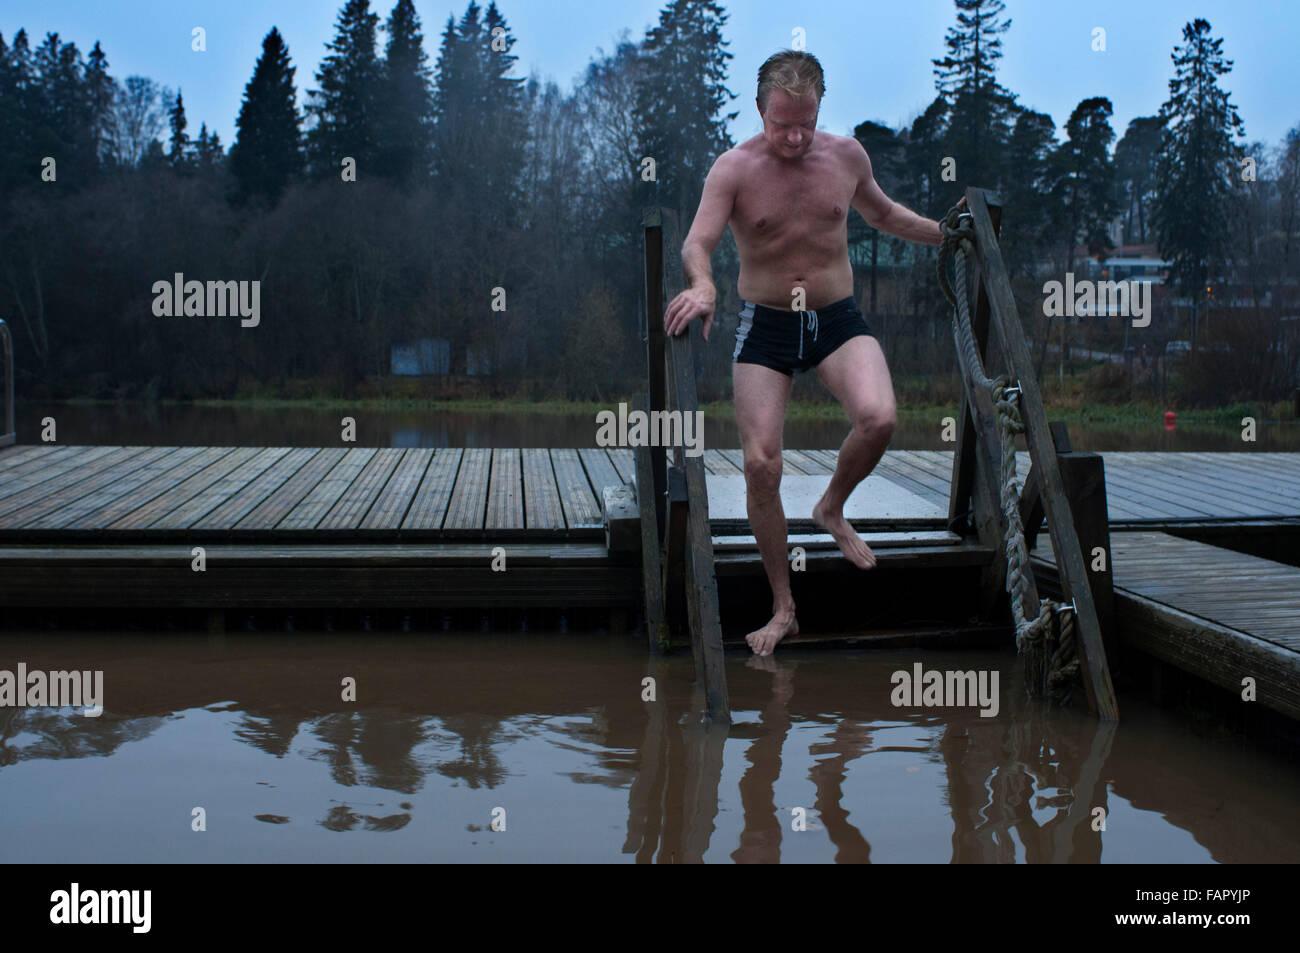 finland winter sauna stockfotos finland winter sauna. Black Bedroom Furniture Sets. Home Design Ideas